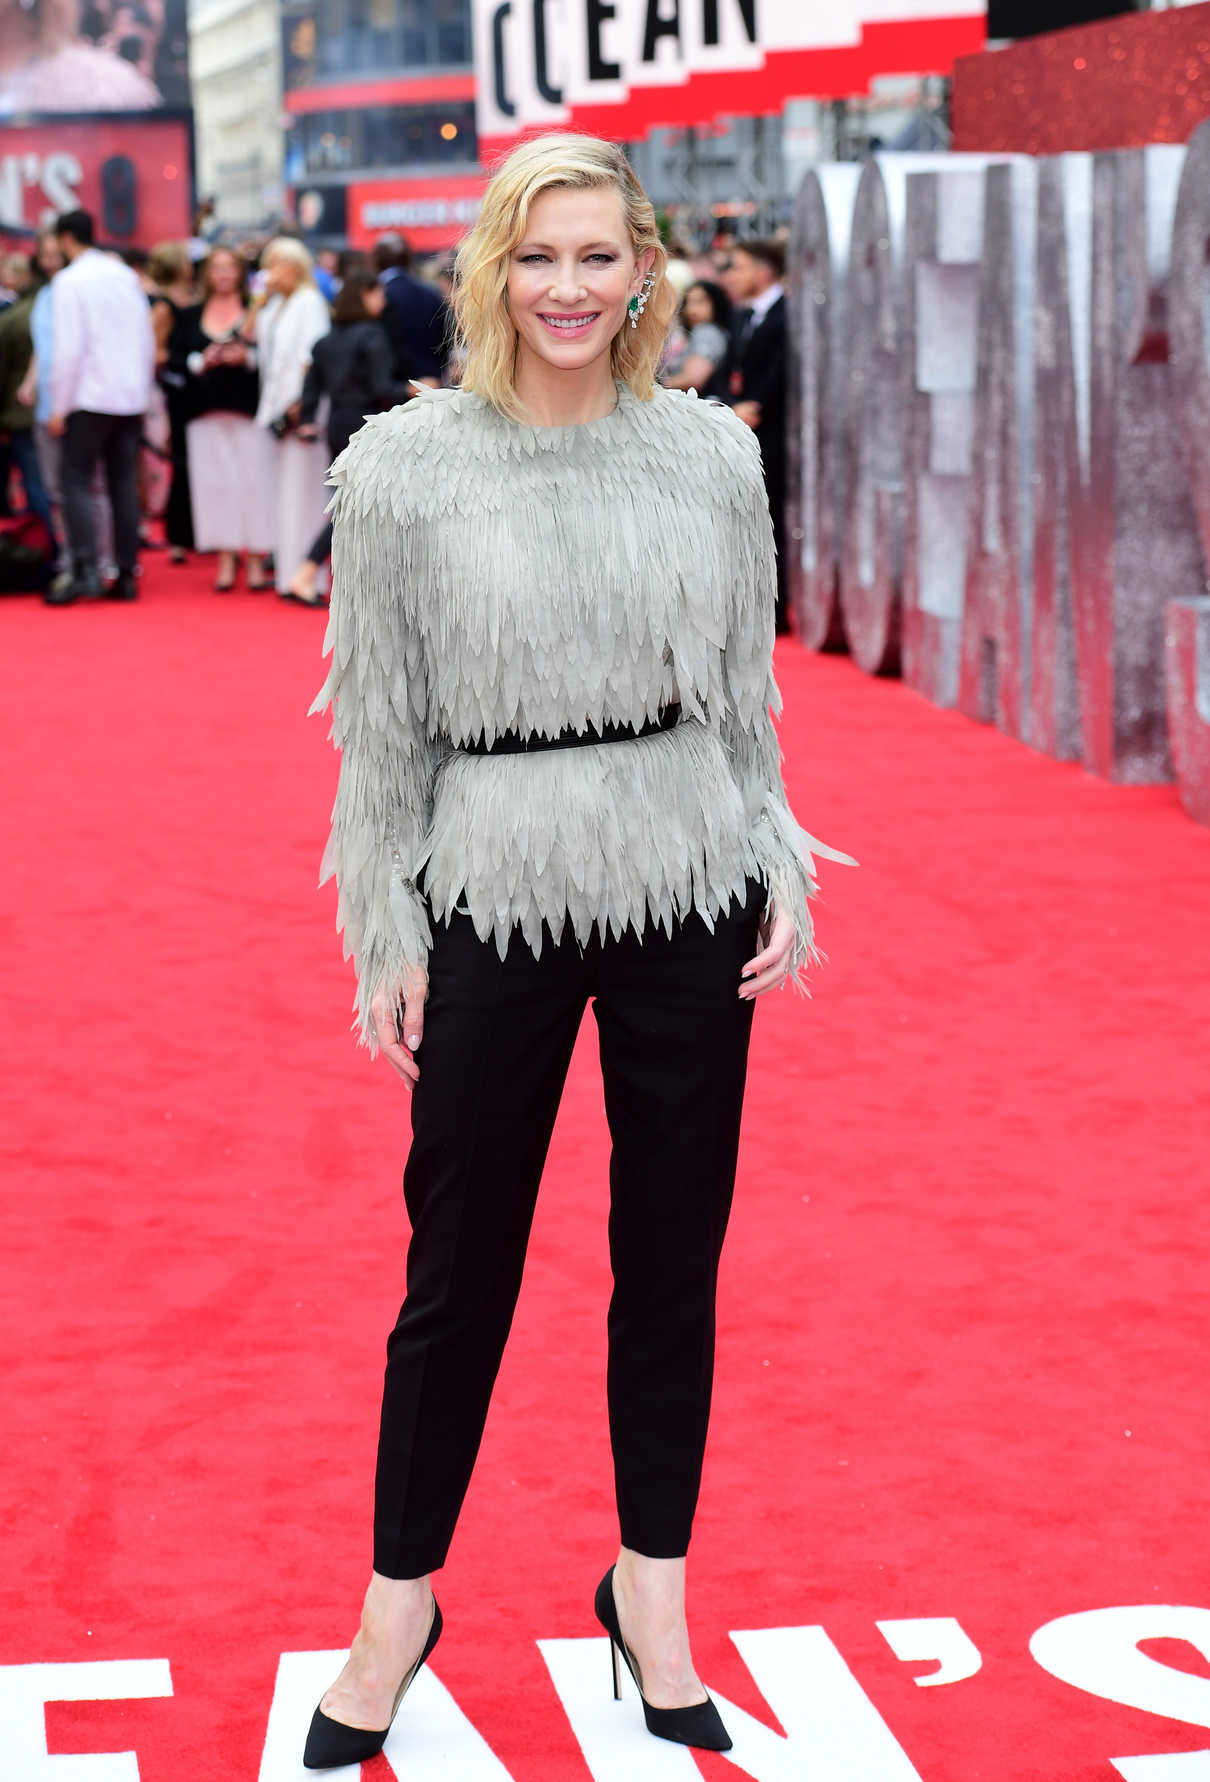 Cate Blanchett at Ocean's 8 Premiere in London 06/13/2018-3